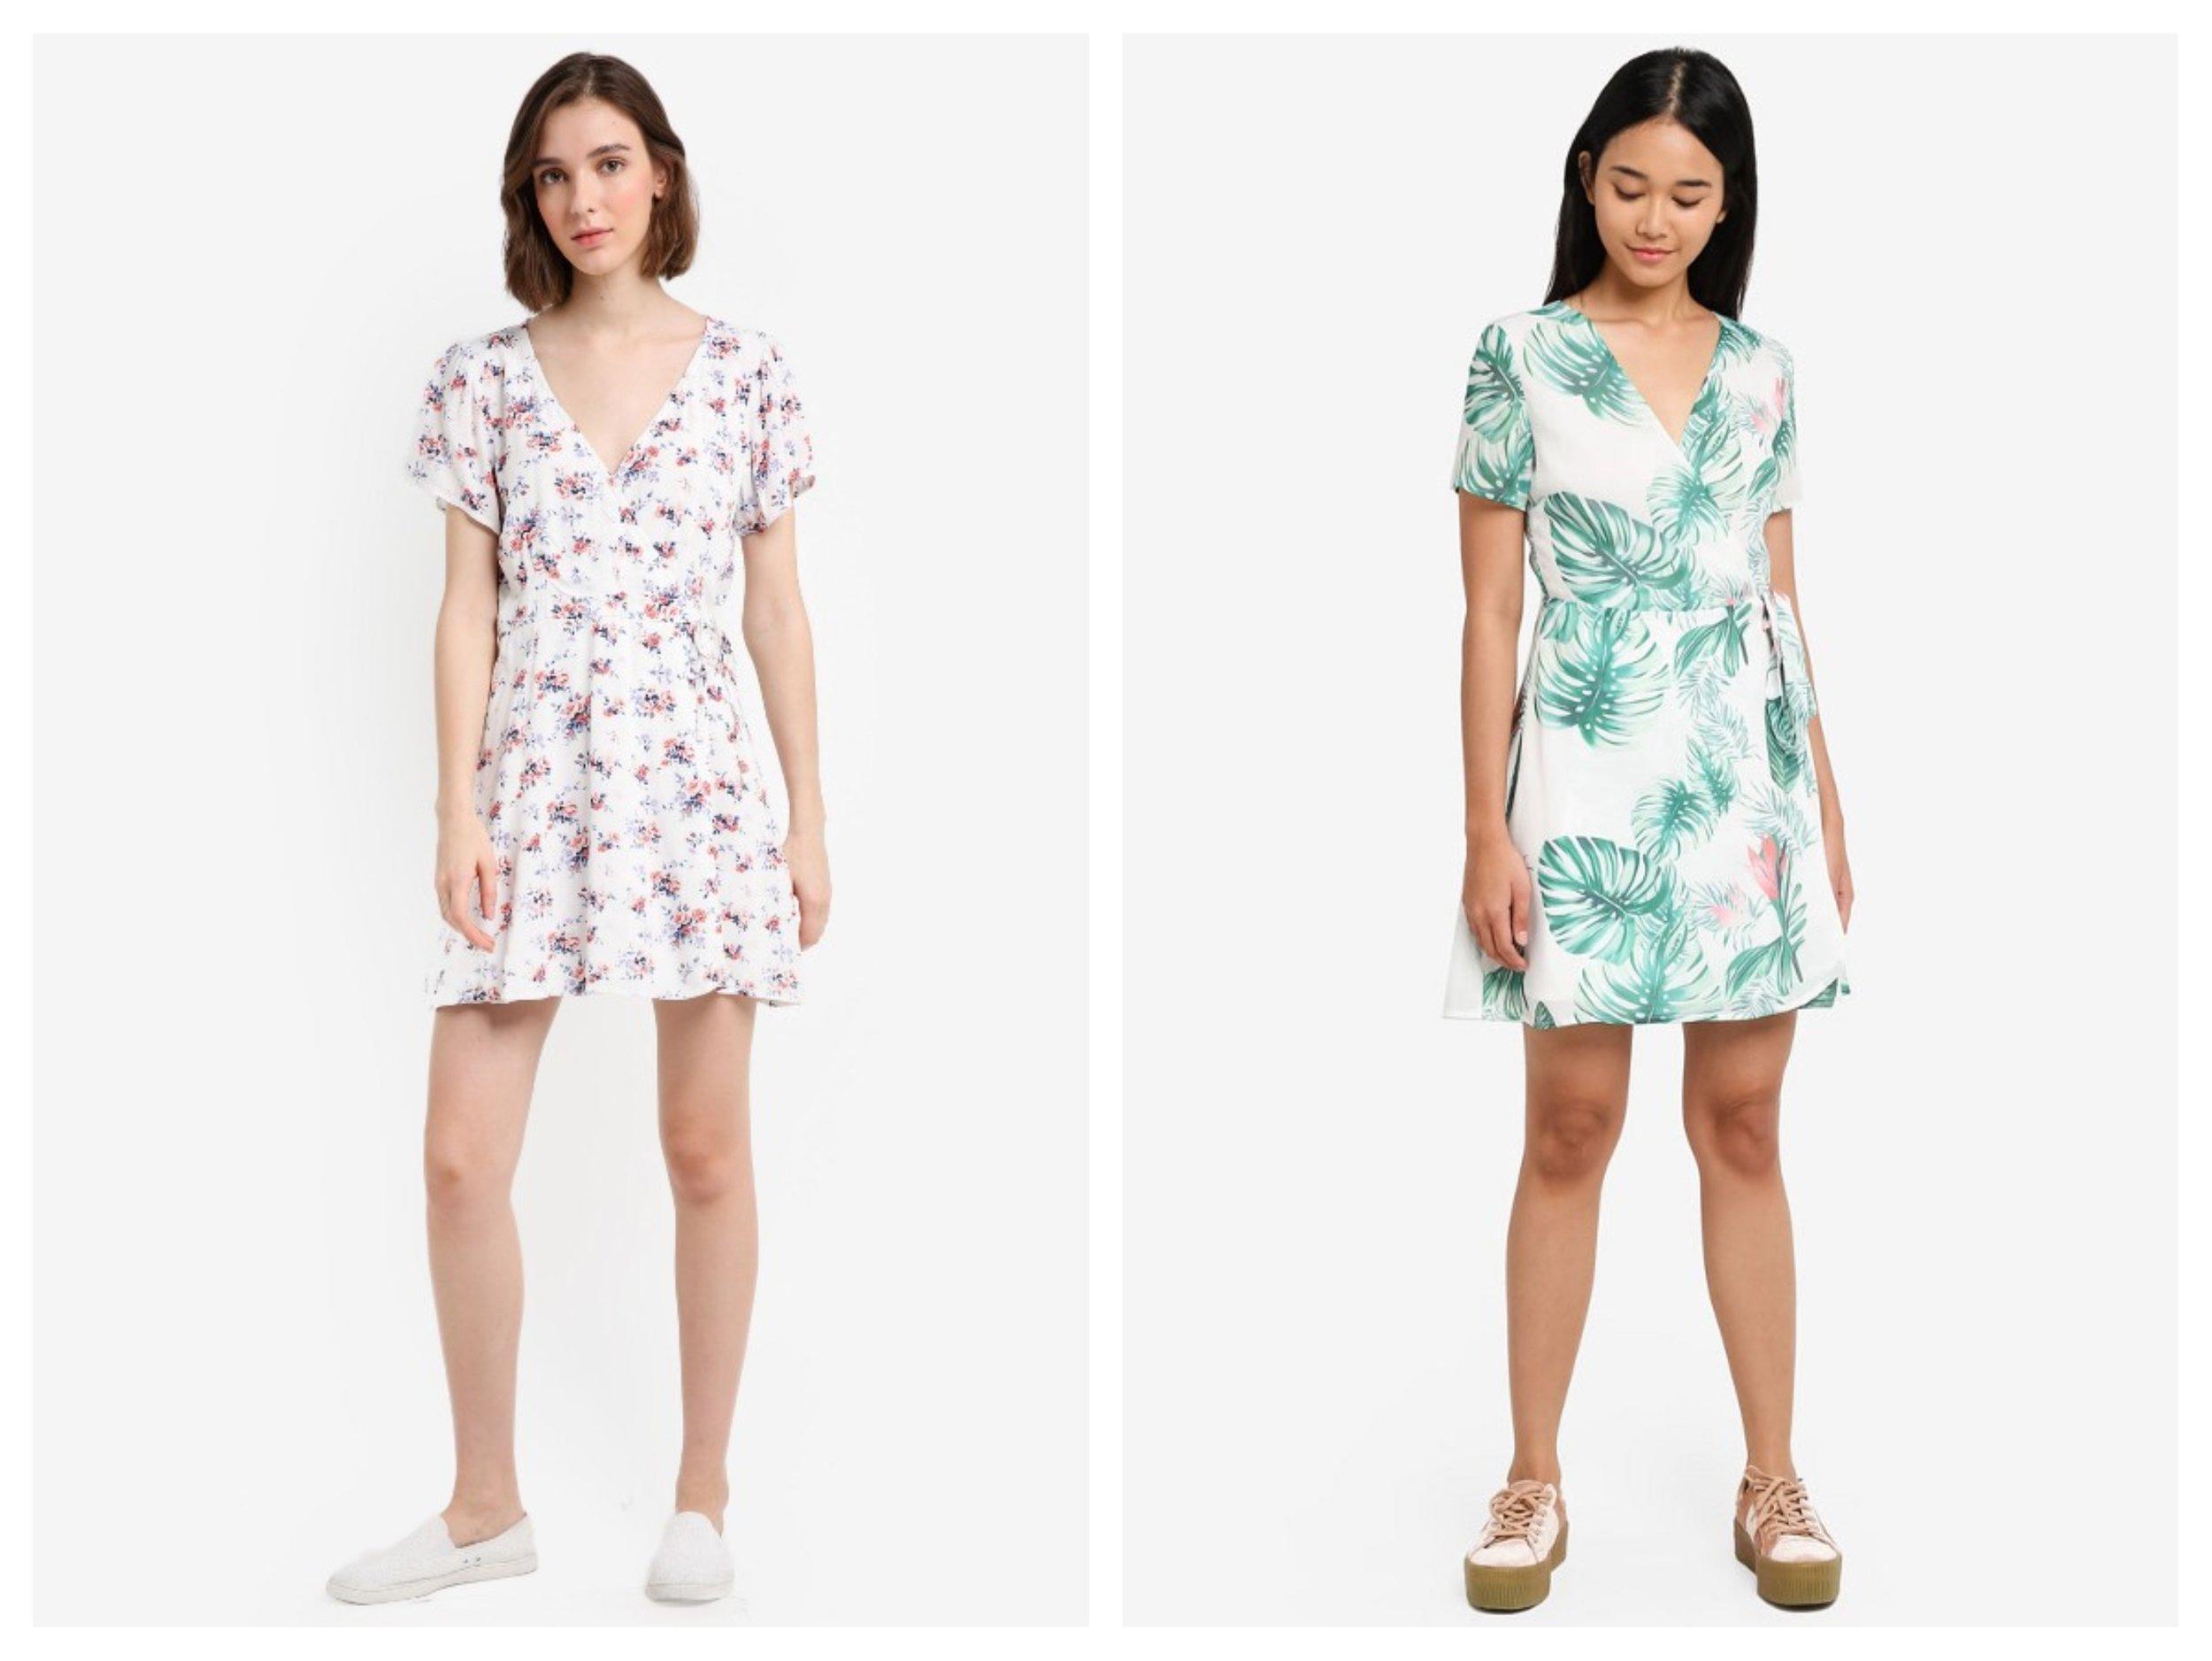 Abercrombie & Fitch Rayon Wrap Dress | Something Borrowed Wrap Mini Dress